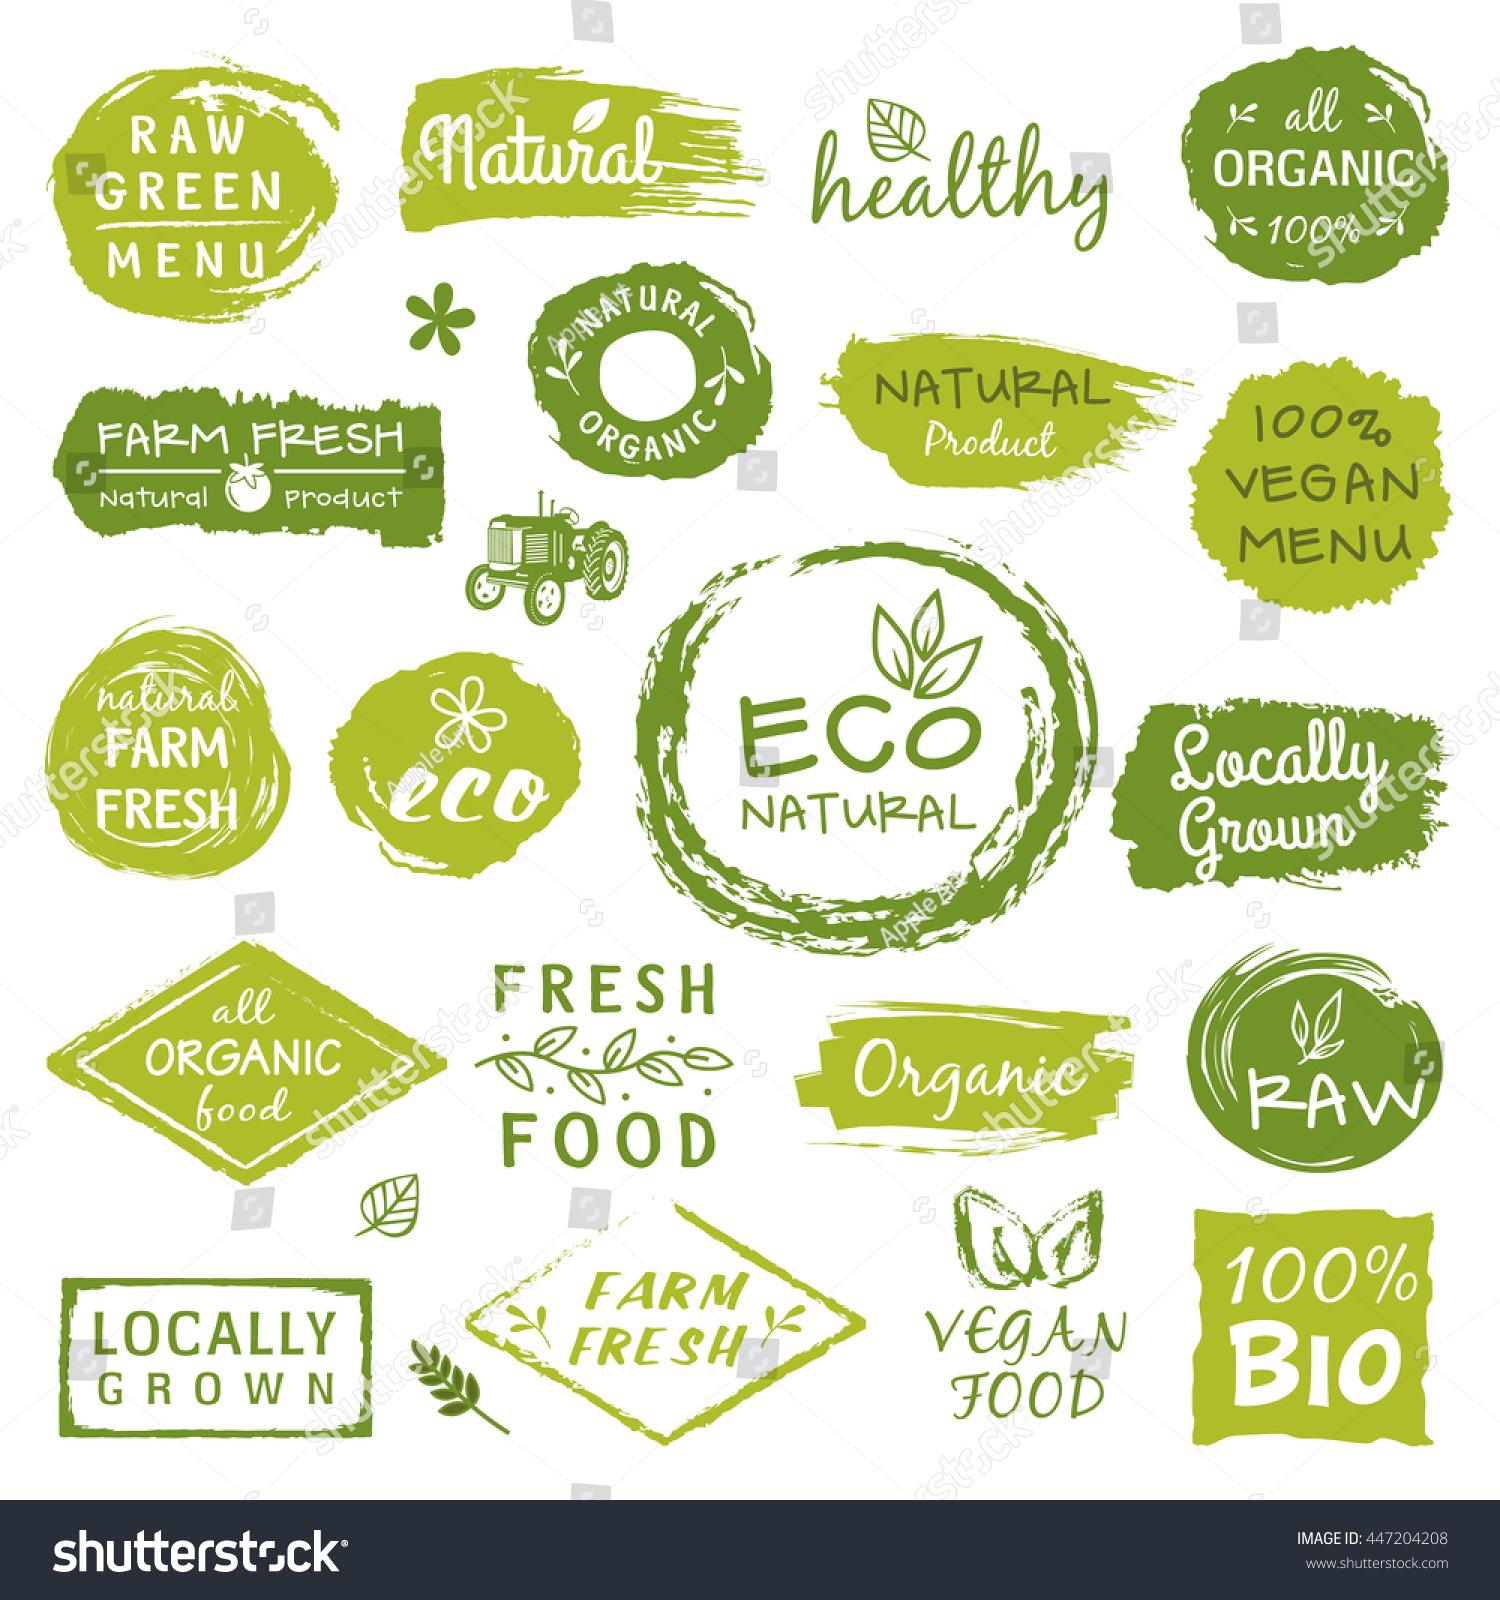 How To Farm Organic Food